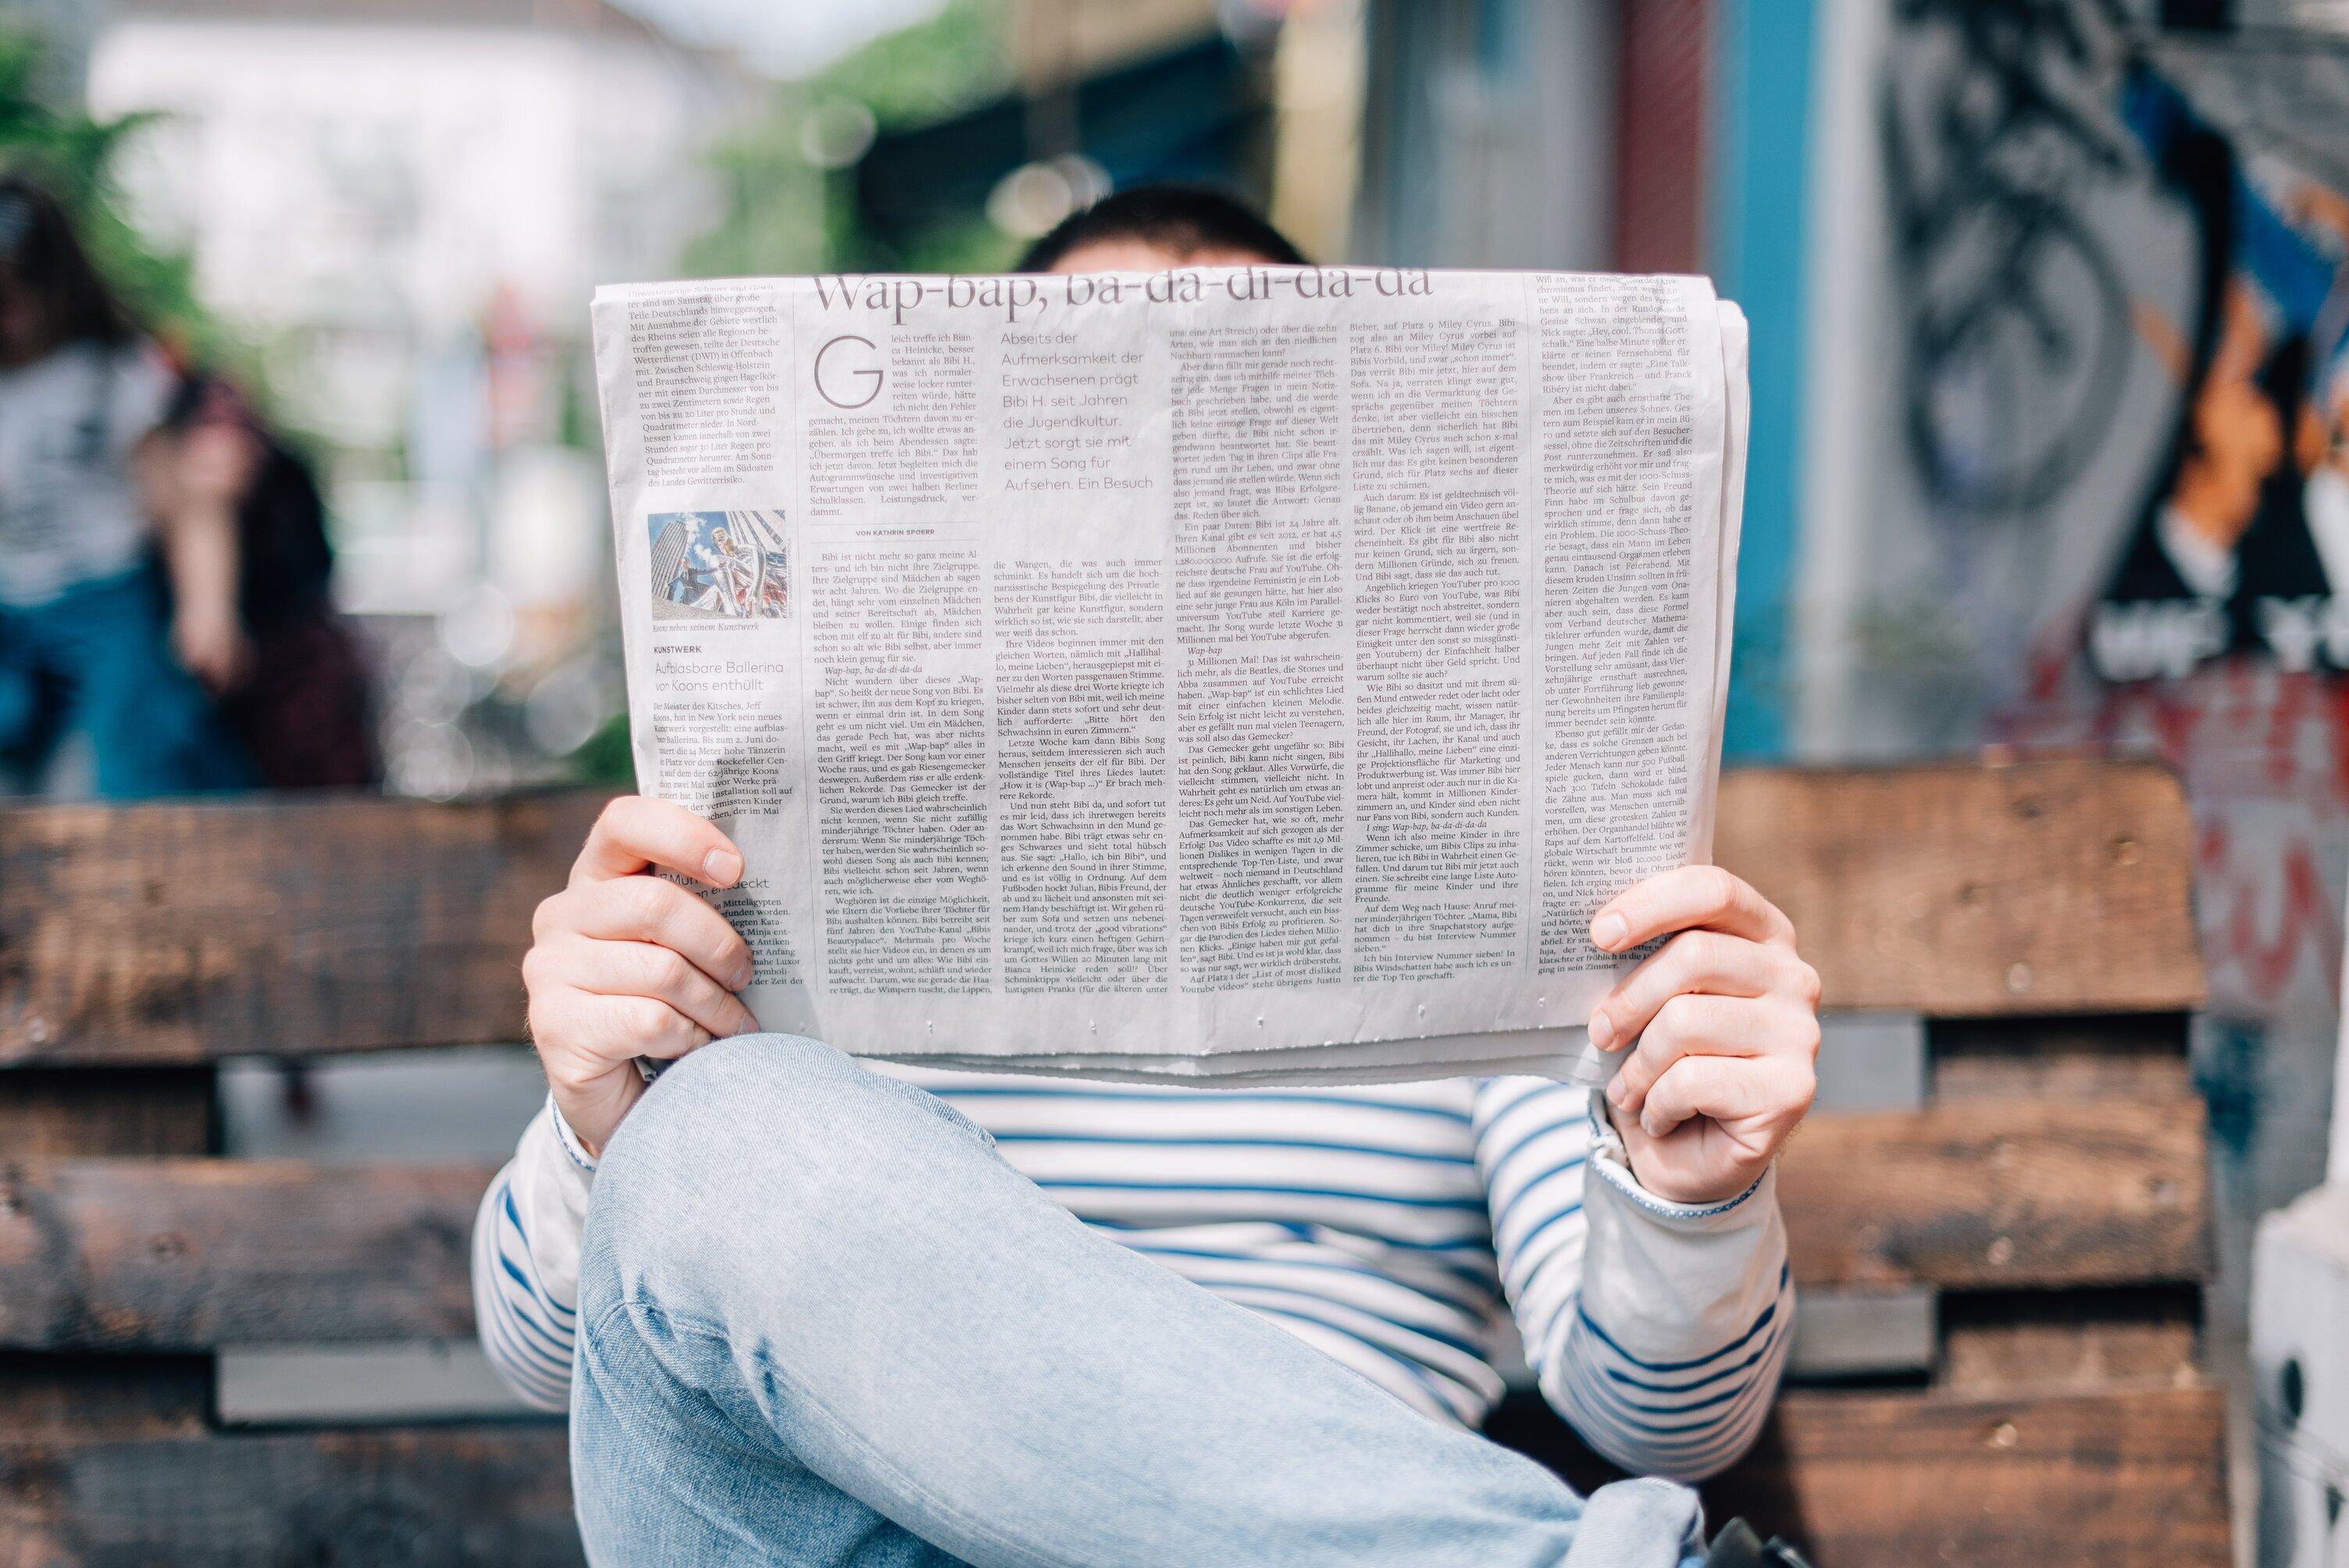 đọc tin tức nỗi sợ OCD